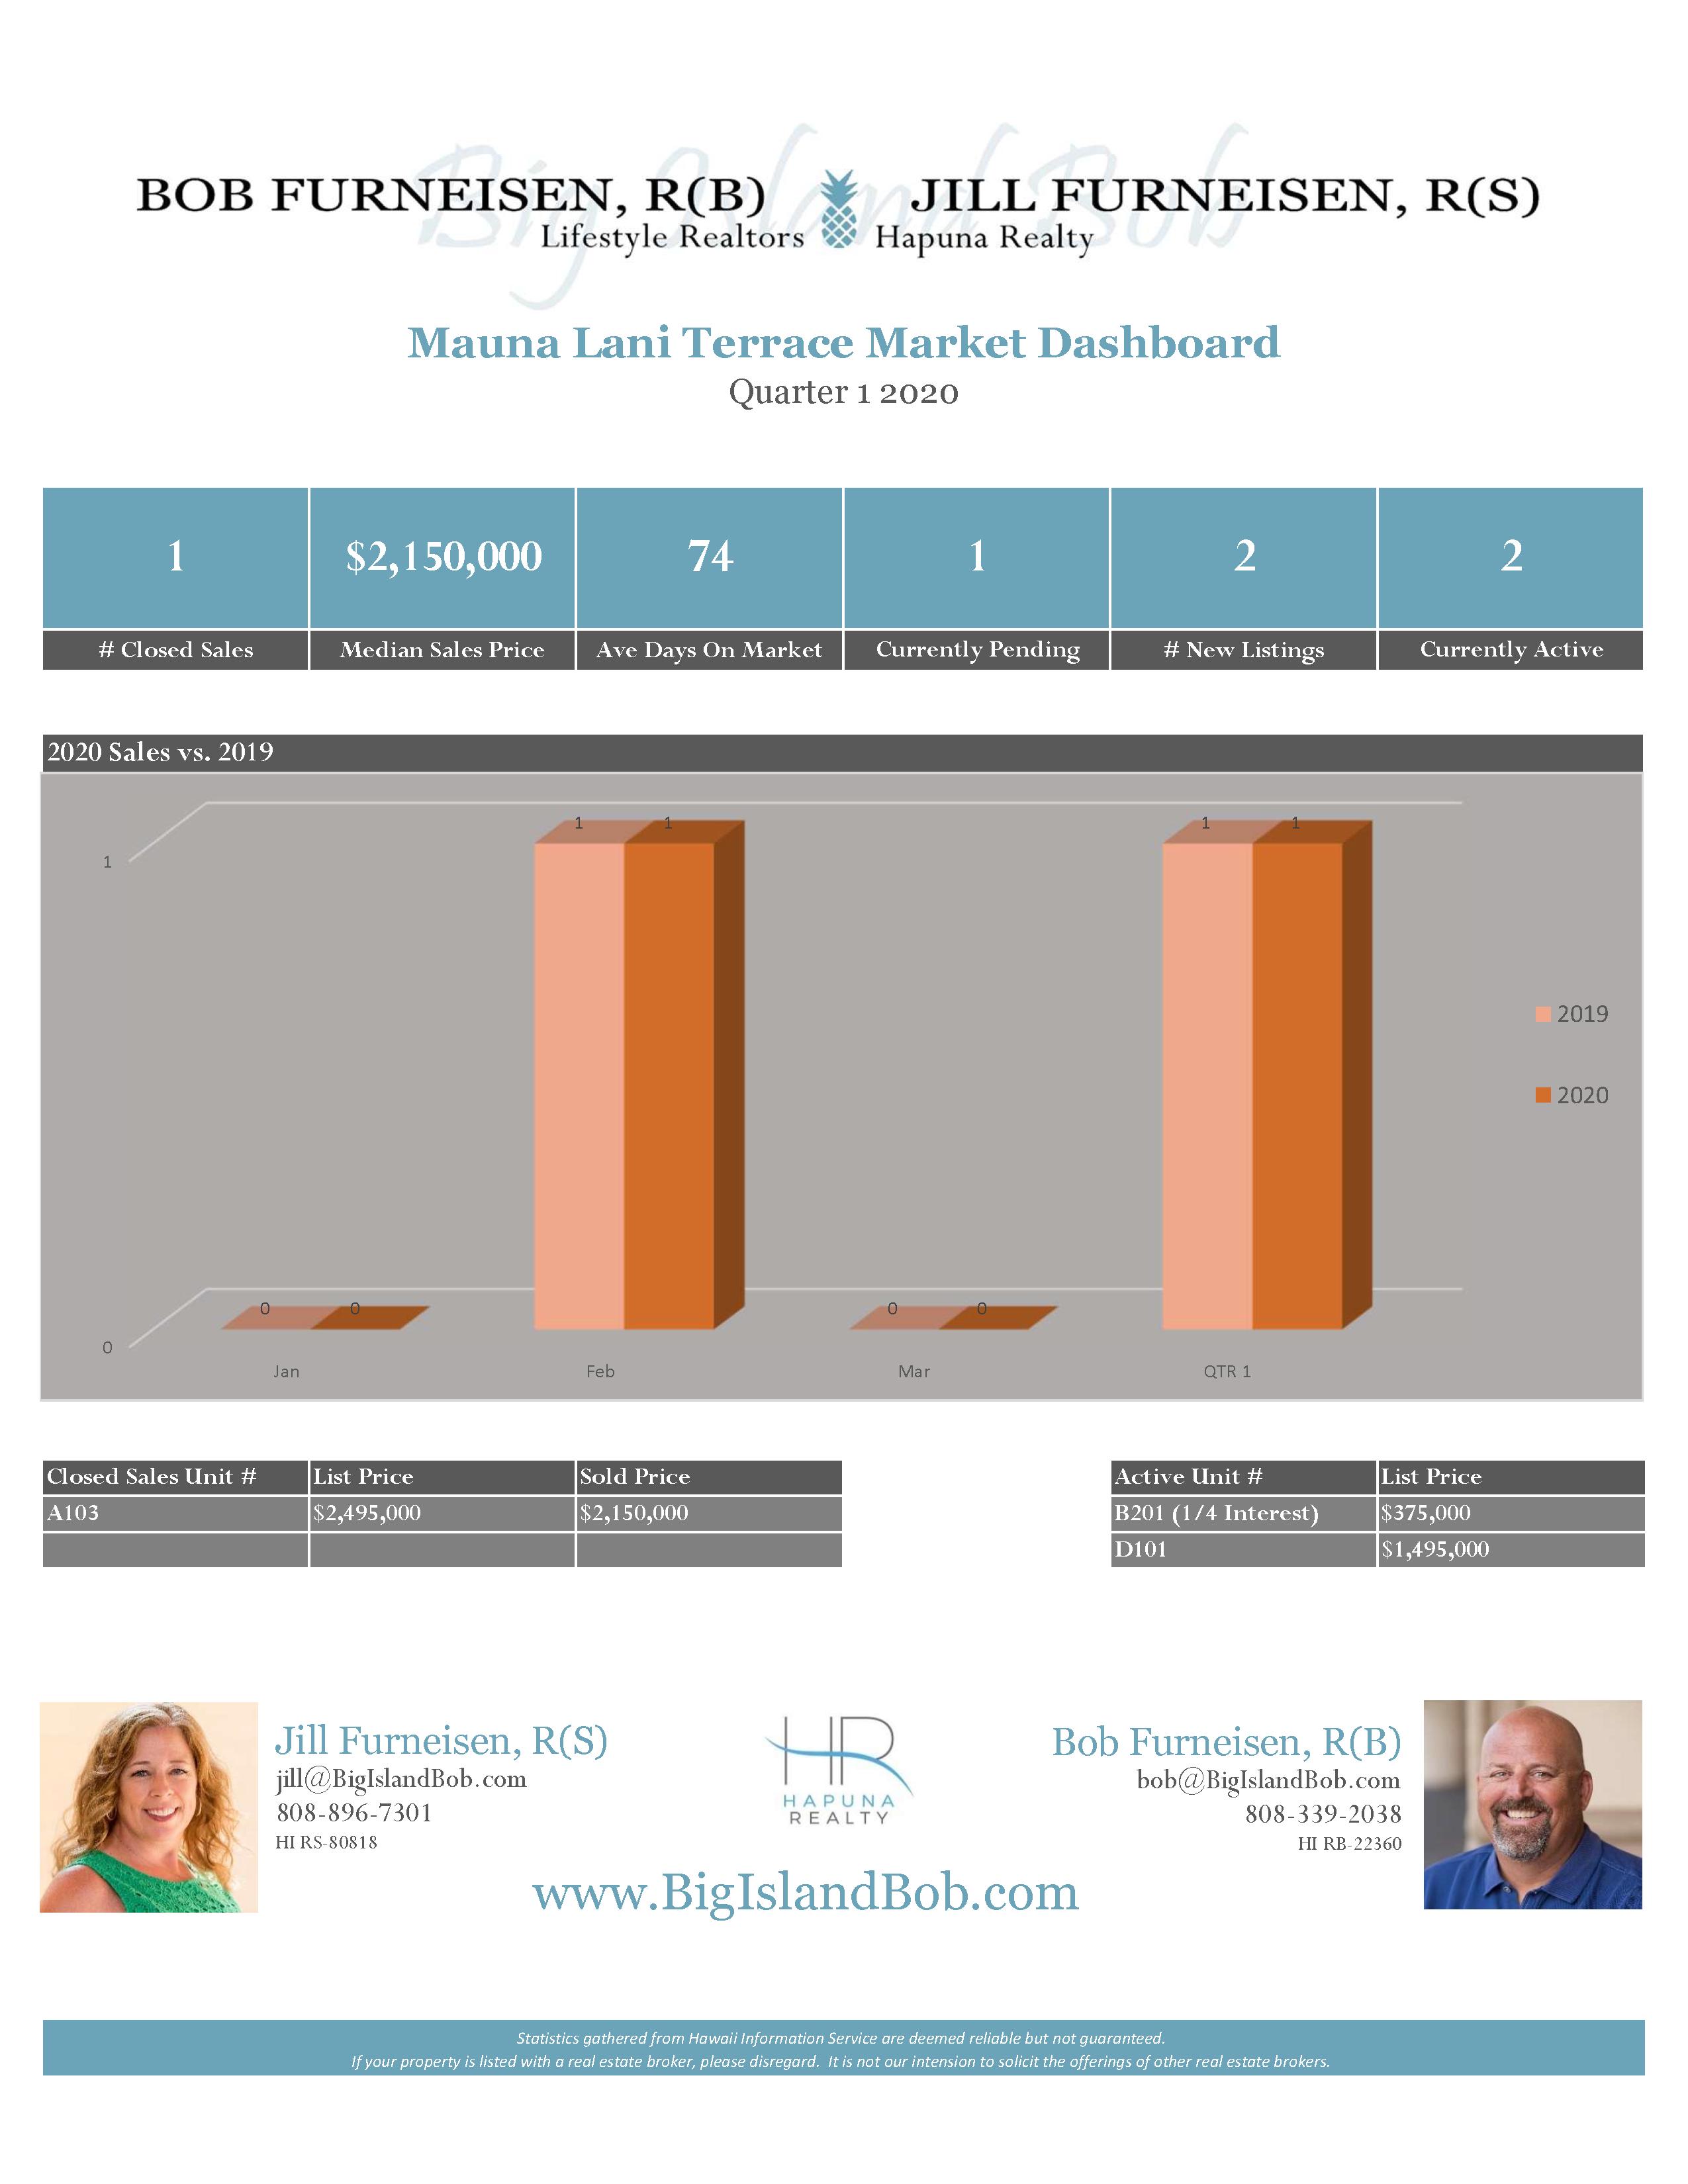 Mauna Lani Terrace Quarter 1 2020 Real Estate Market Dashboard